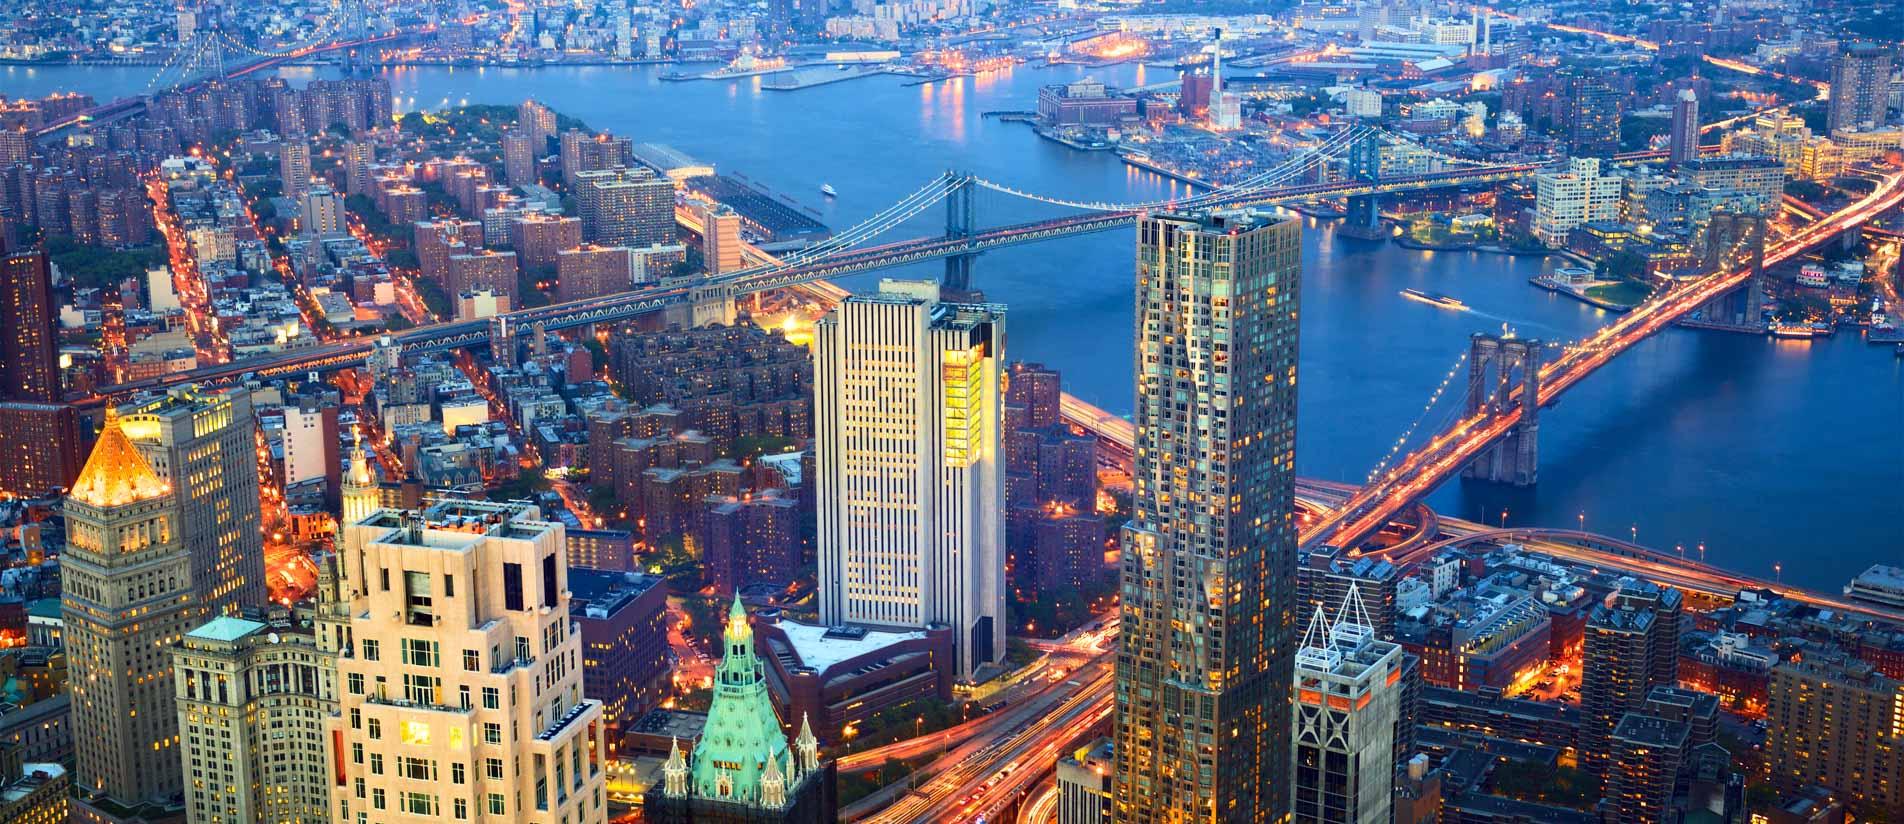 Kaplan Нью-Йорк